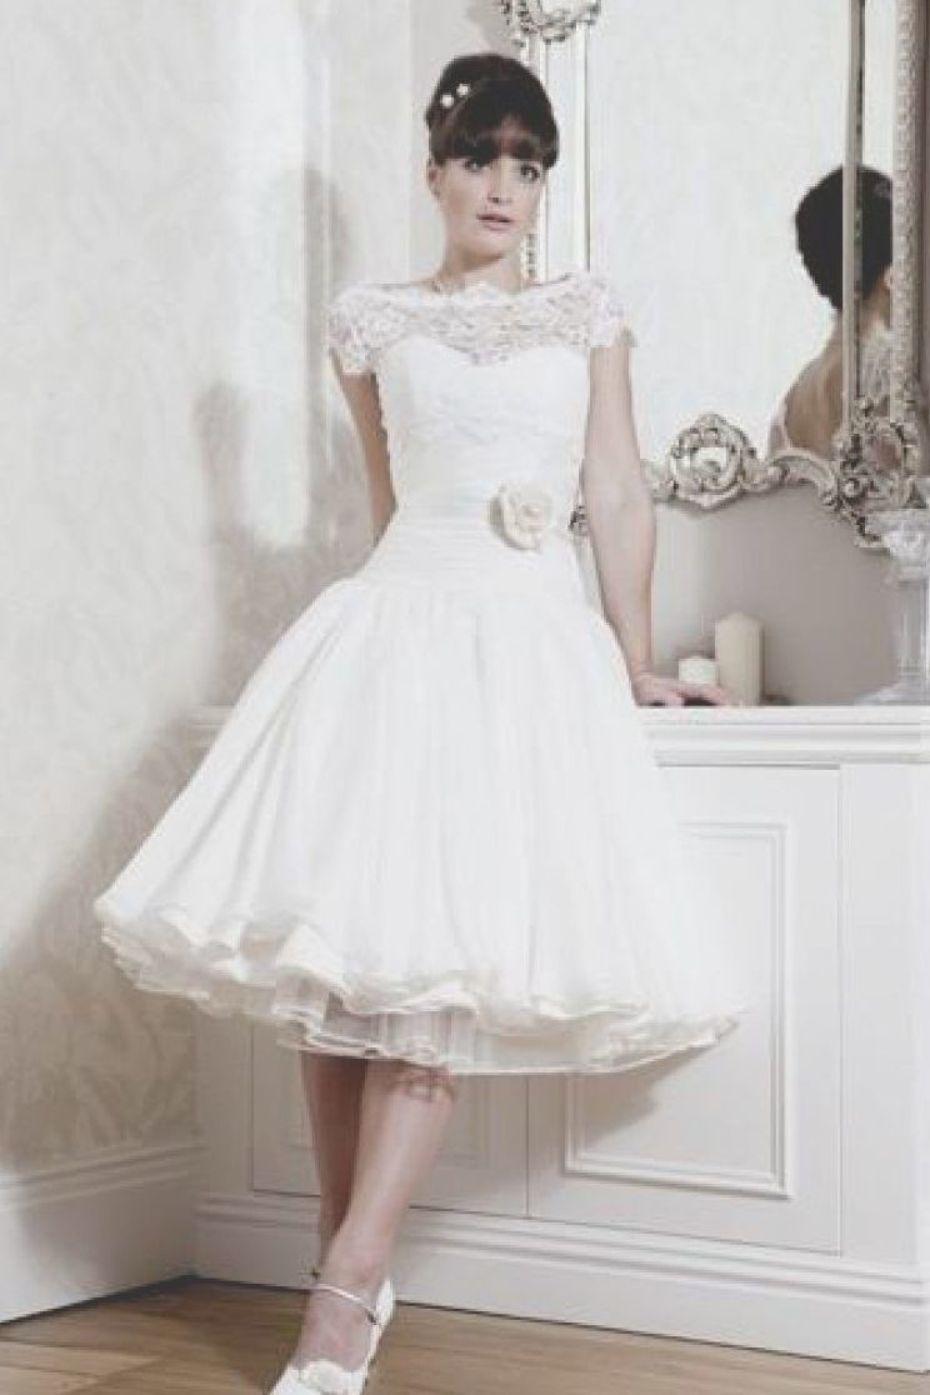 Luxury Vintage 50s Wedding Dresses Wedding Ideas Wedding Dresses 50s Vintage Dresses 50s Short White Lace Wedding Dress